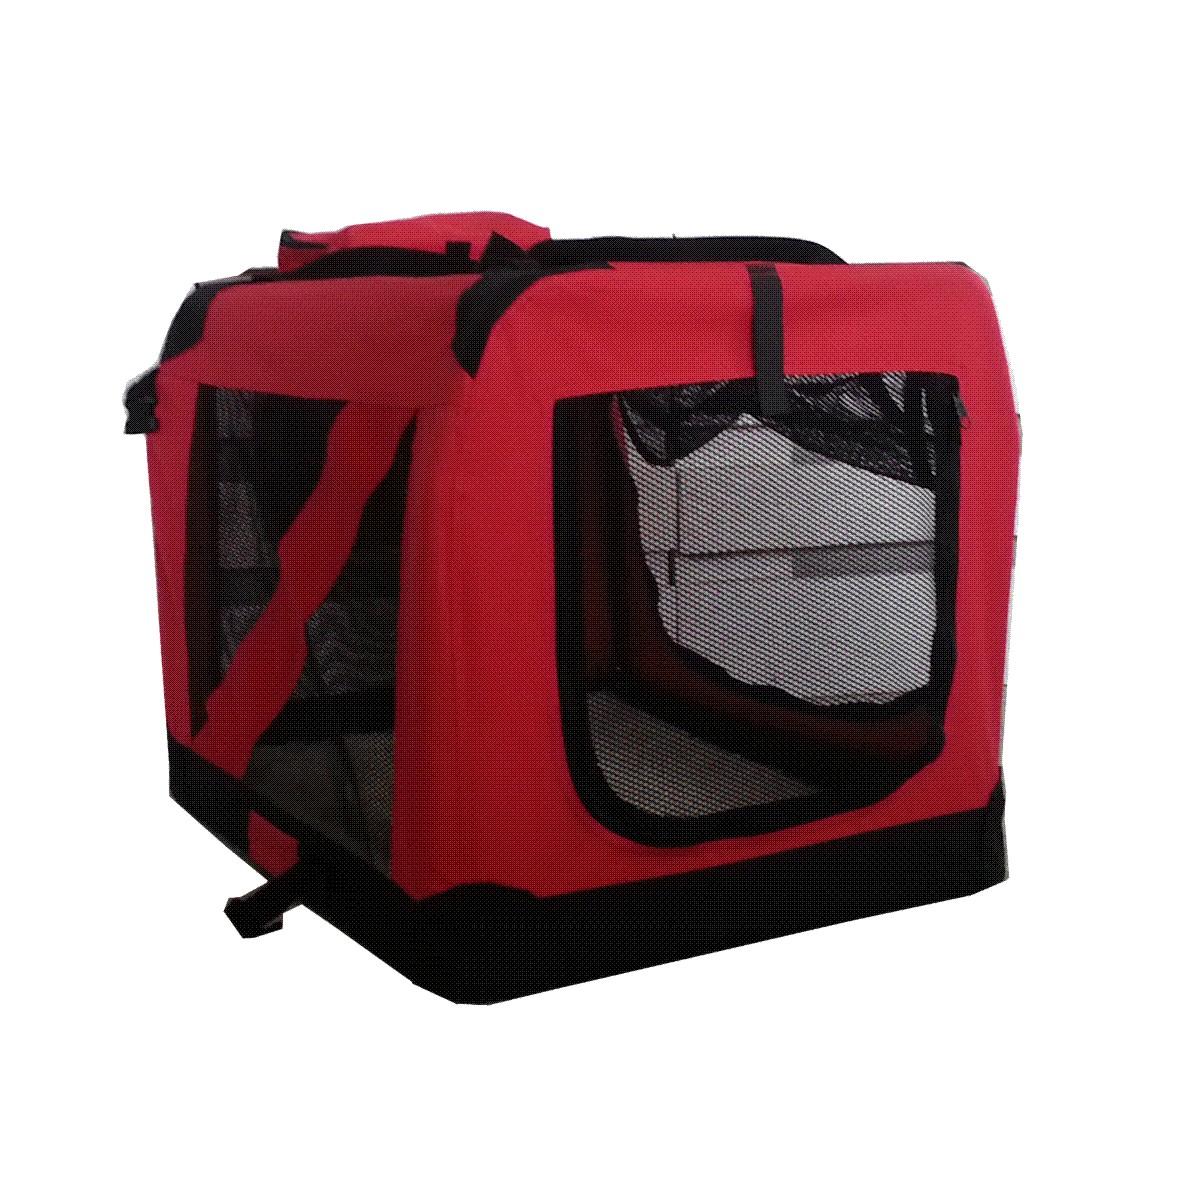 Traveller BOX